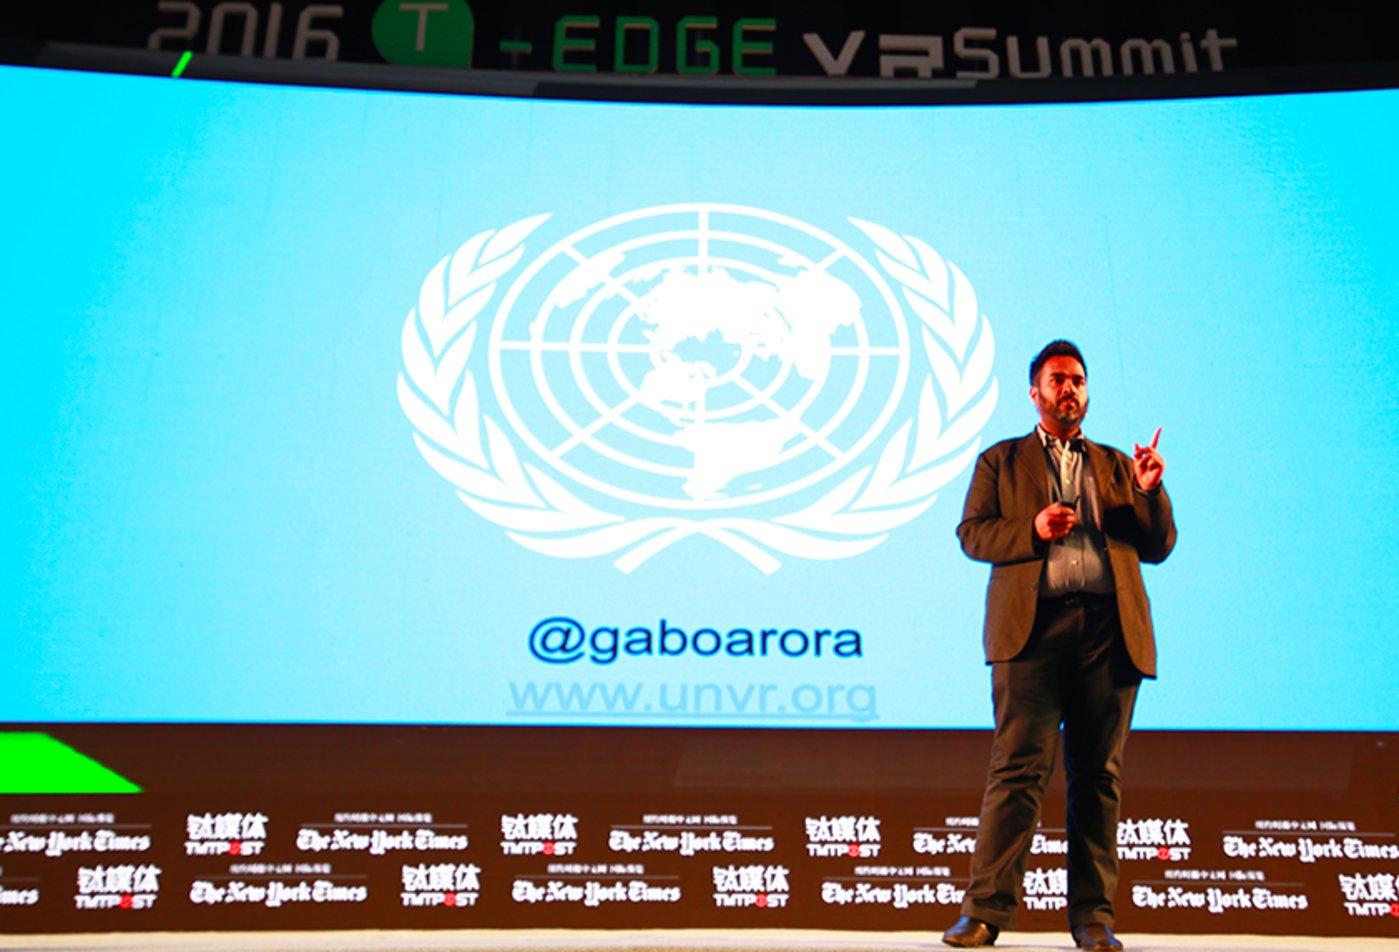 电影制作人、联合国影像顾问、LightShed创始人Gabo Arora